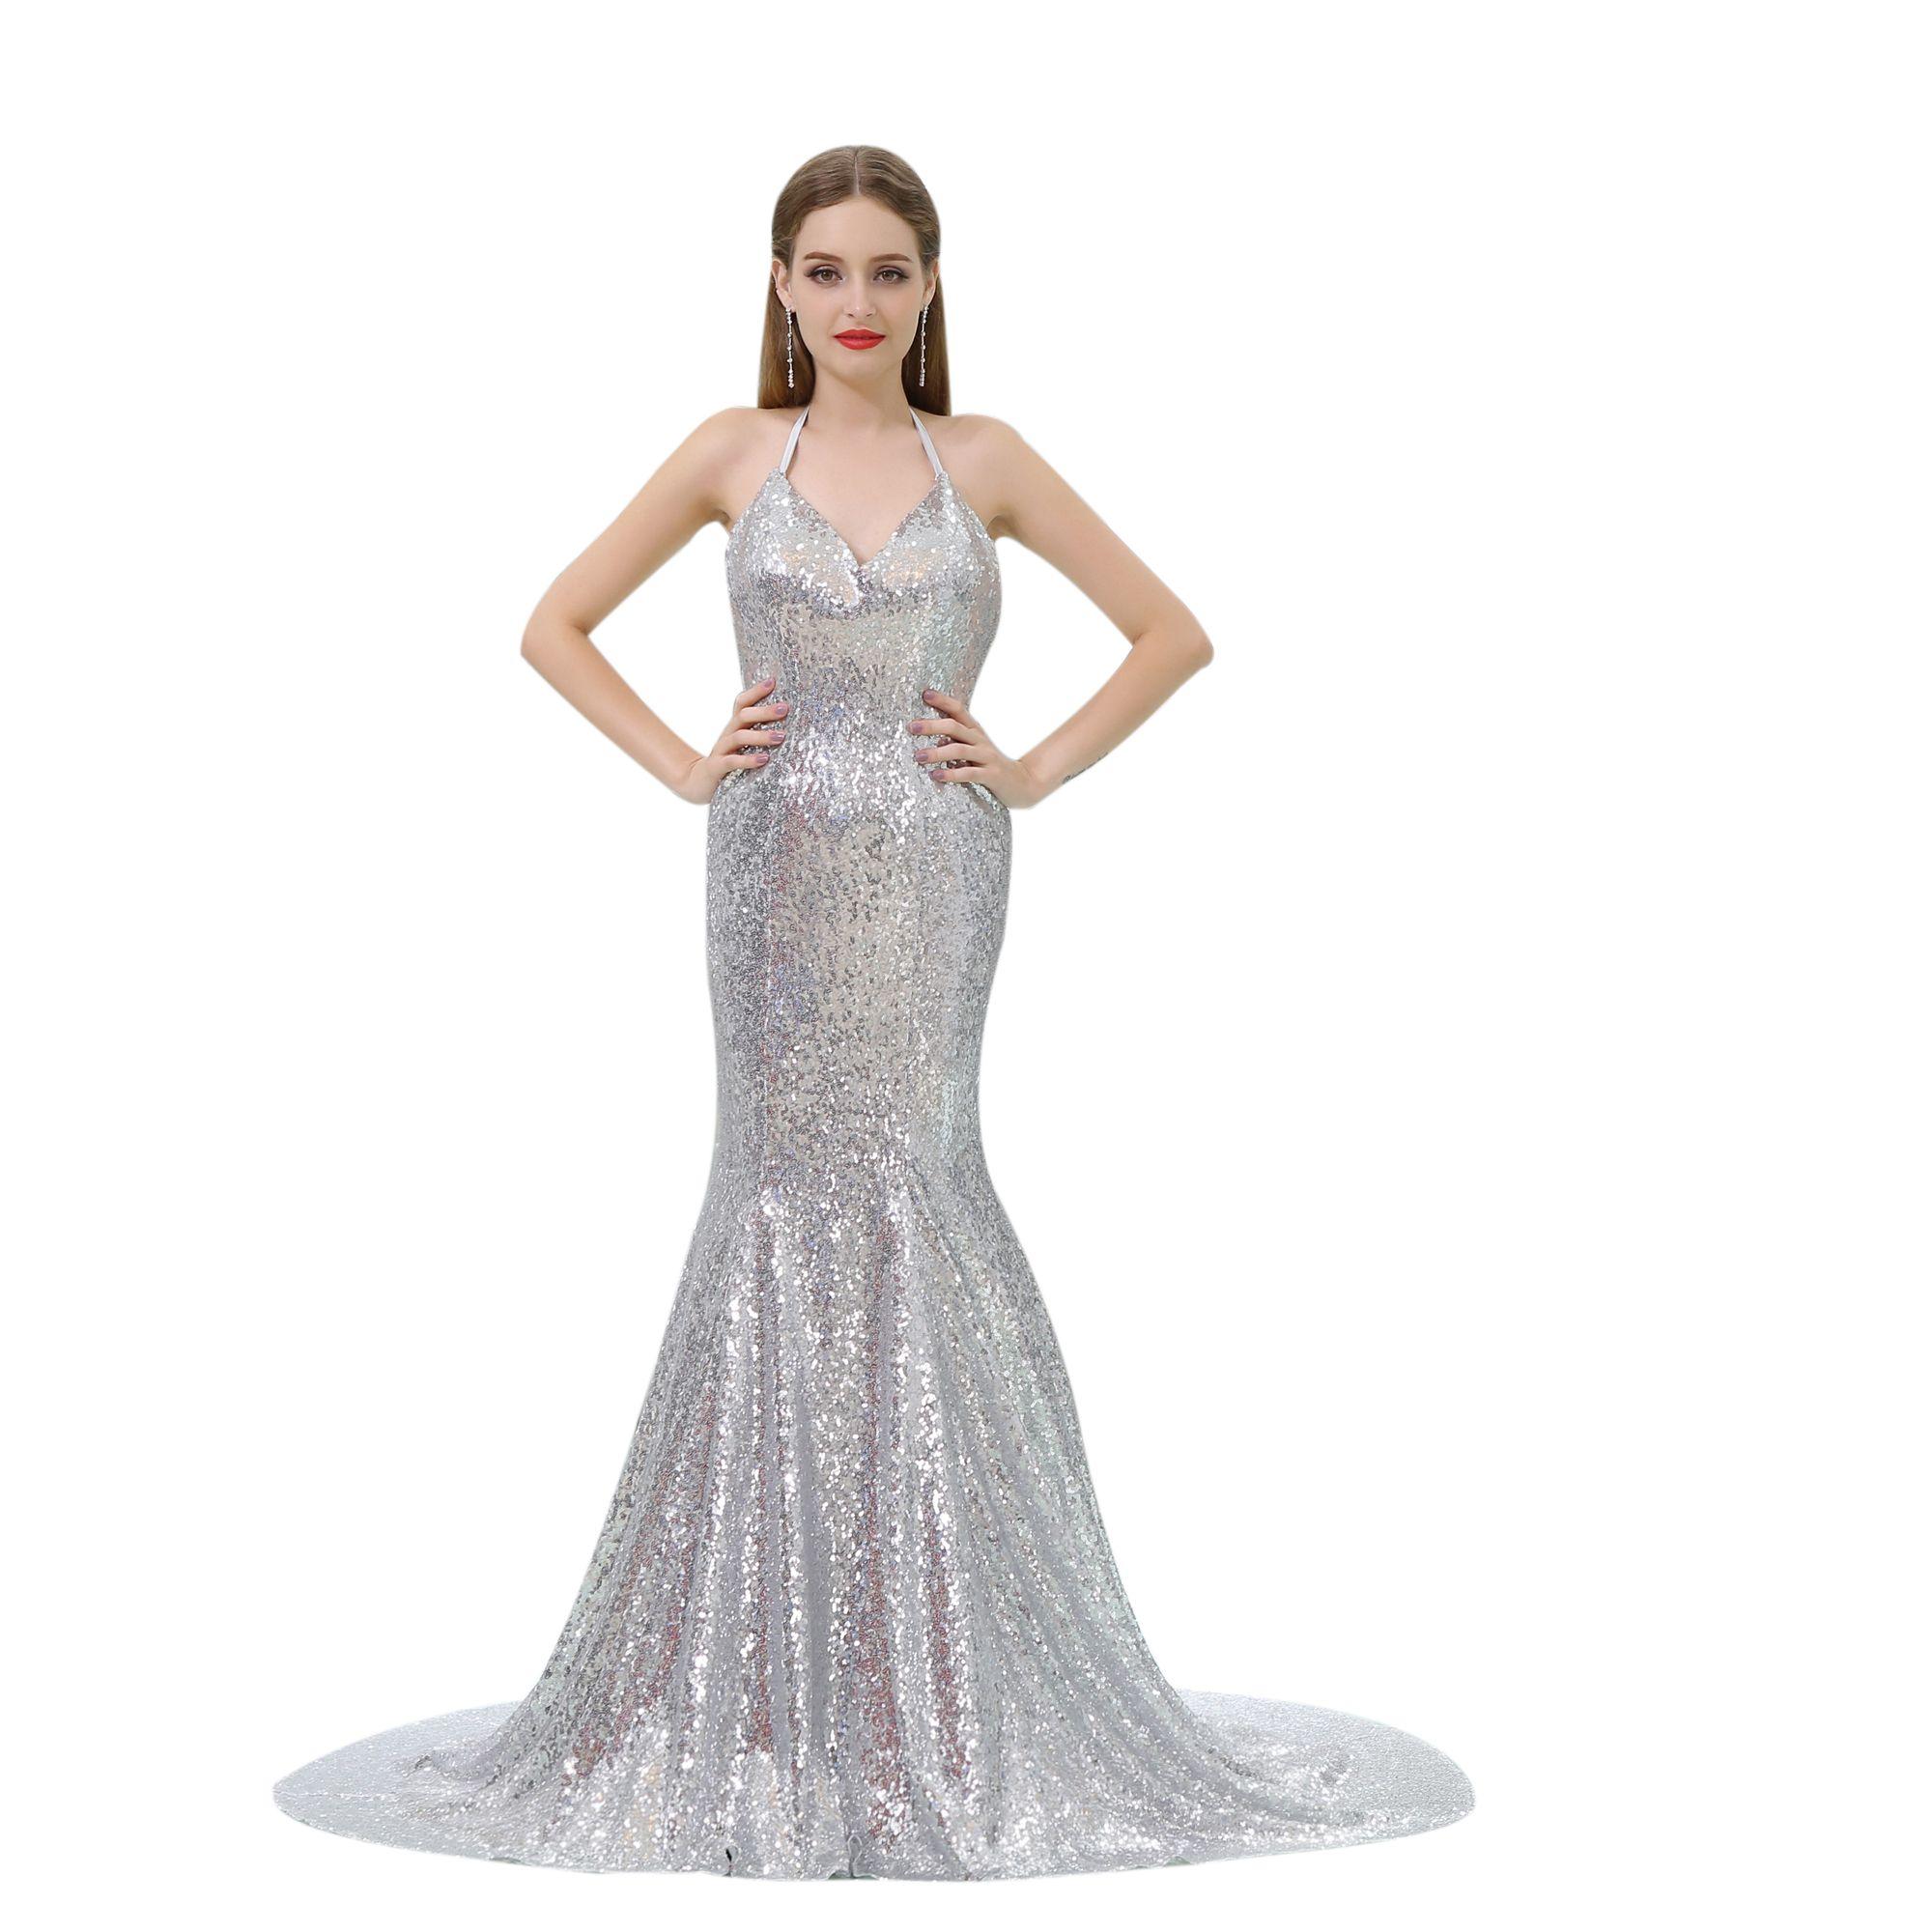 373ff5f99f1ba Full Length Sequin Dress Australia - raveitsafe